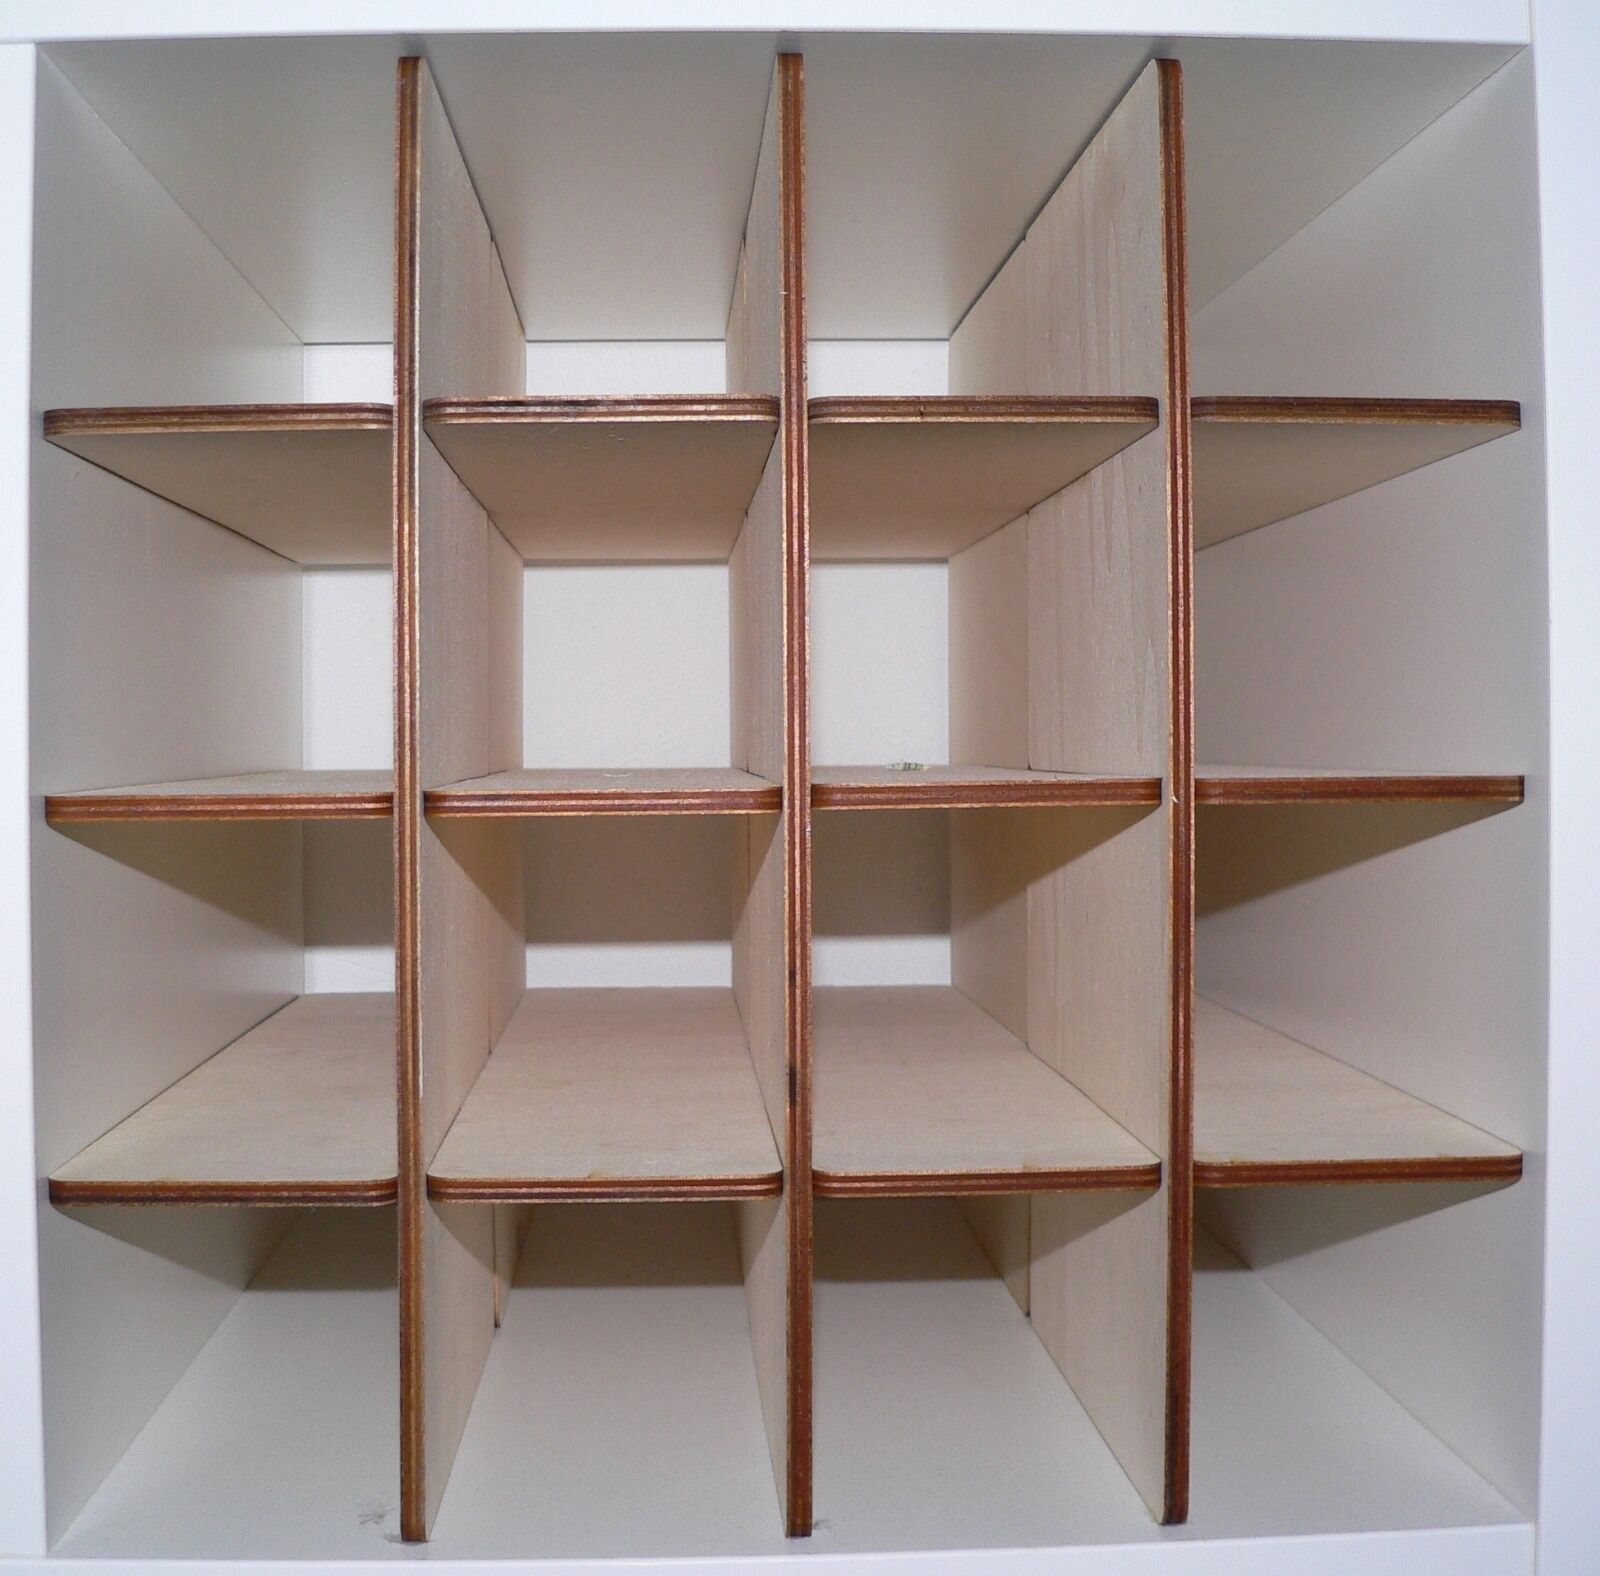 flaschenregale mehr als 500 angebote fotos preise. Black Bedroom Furniture Sets. Home Design Ideas